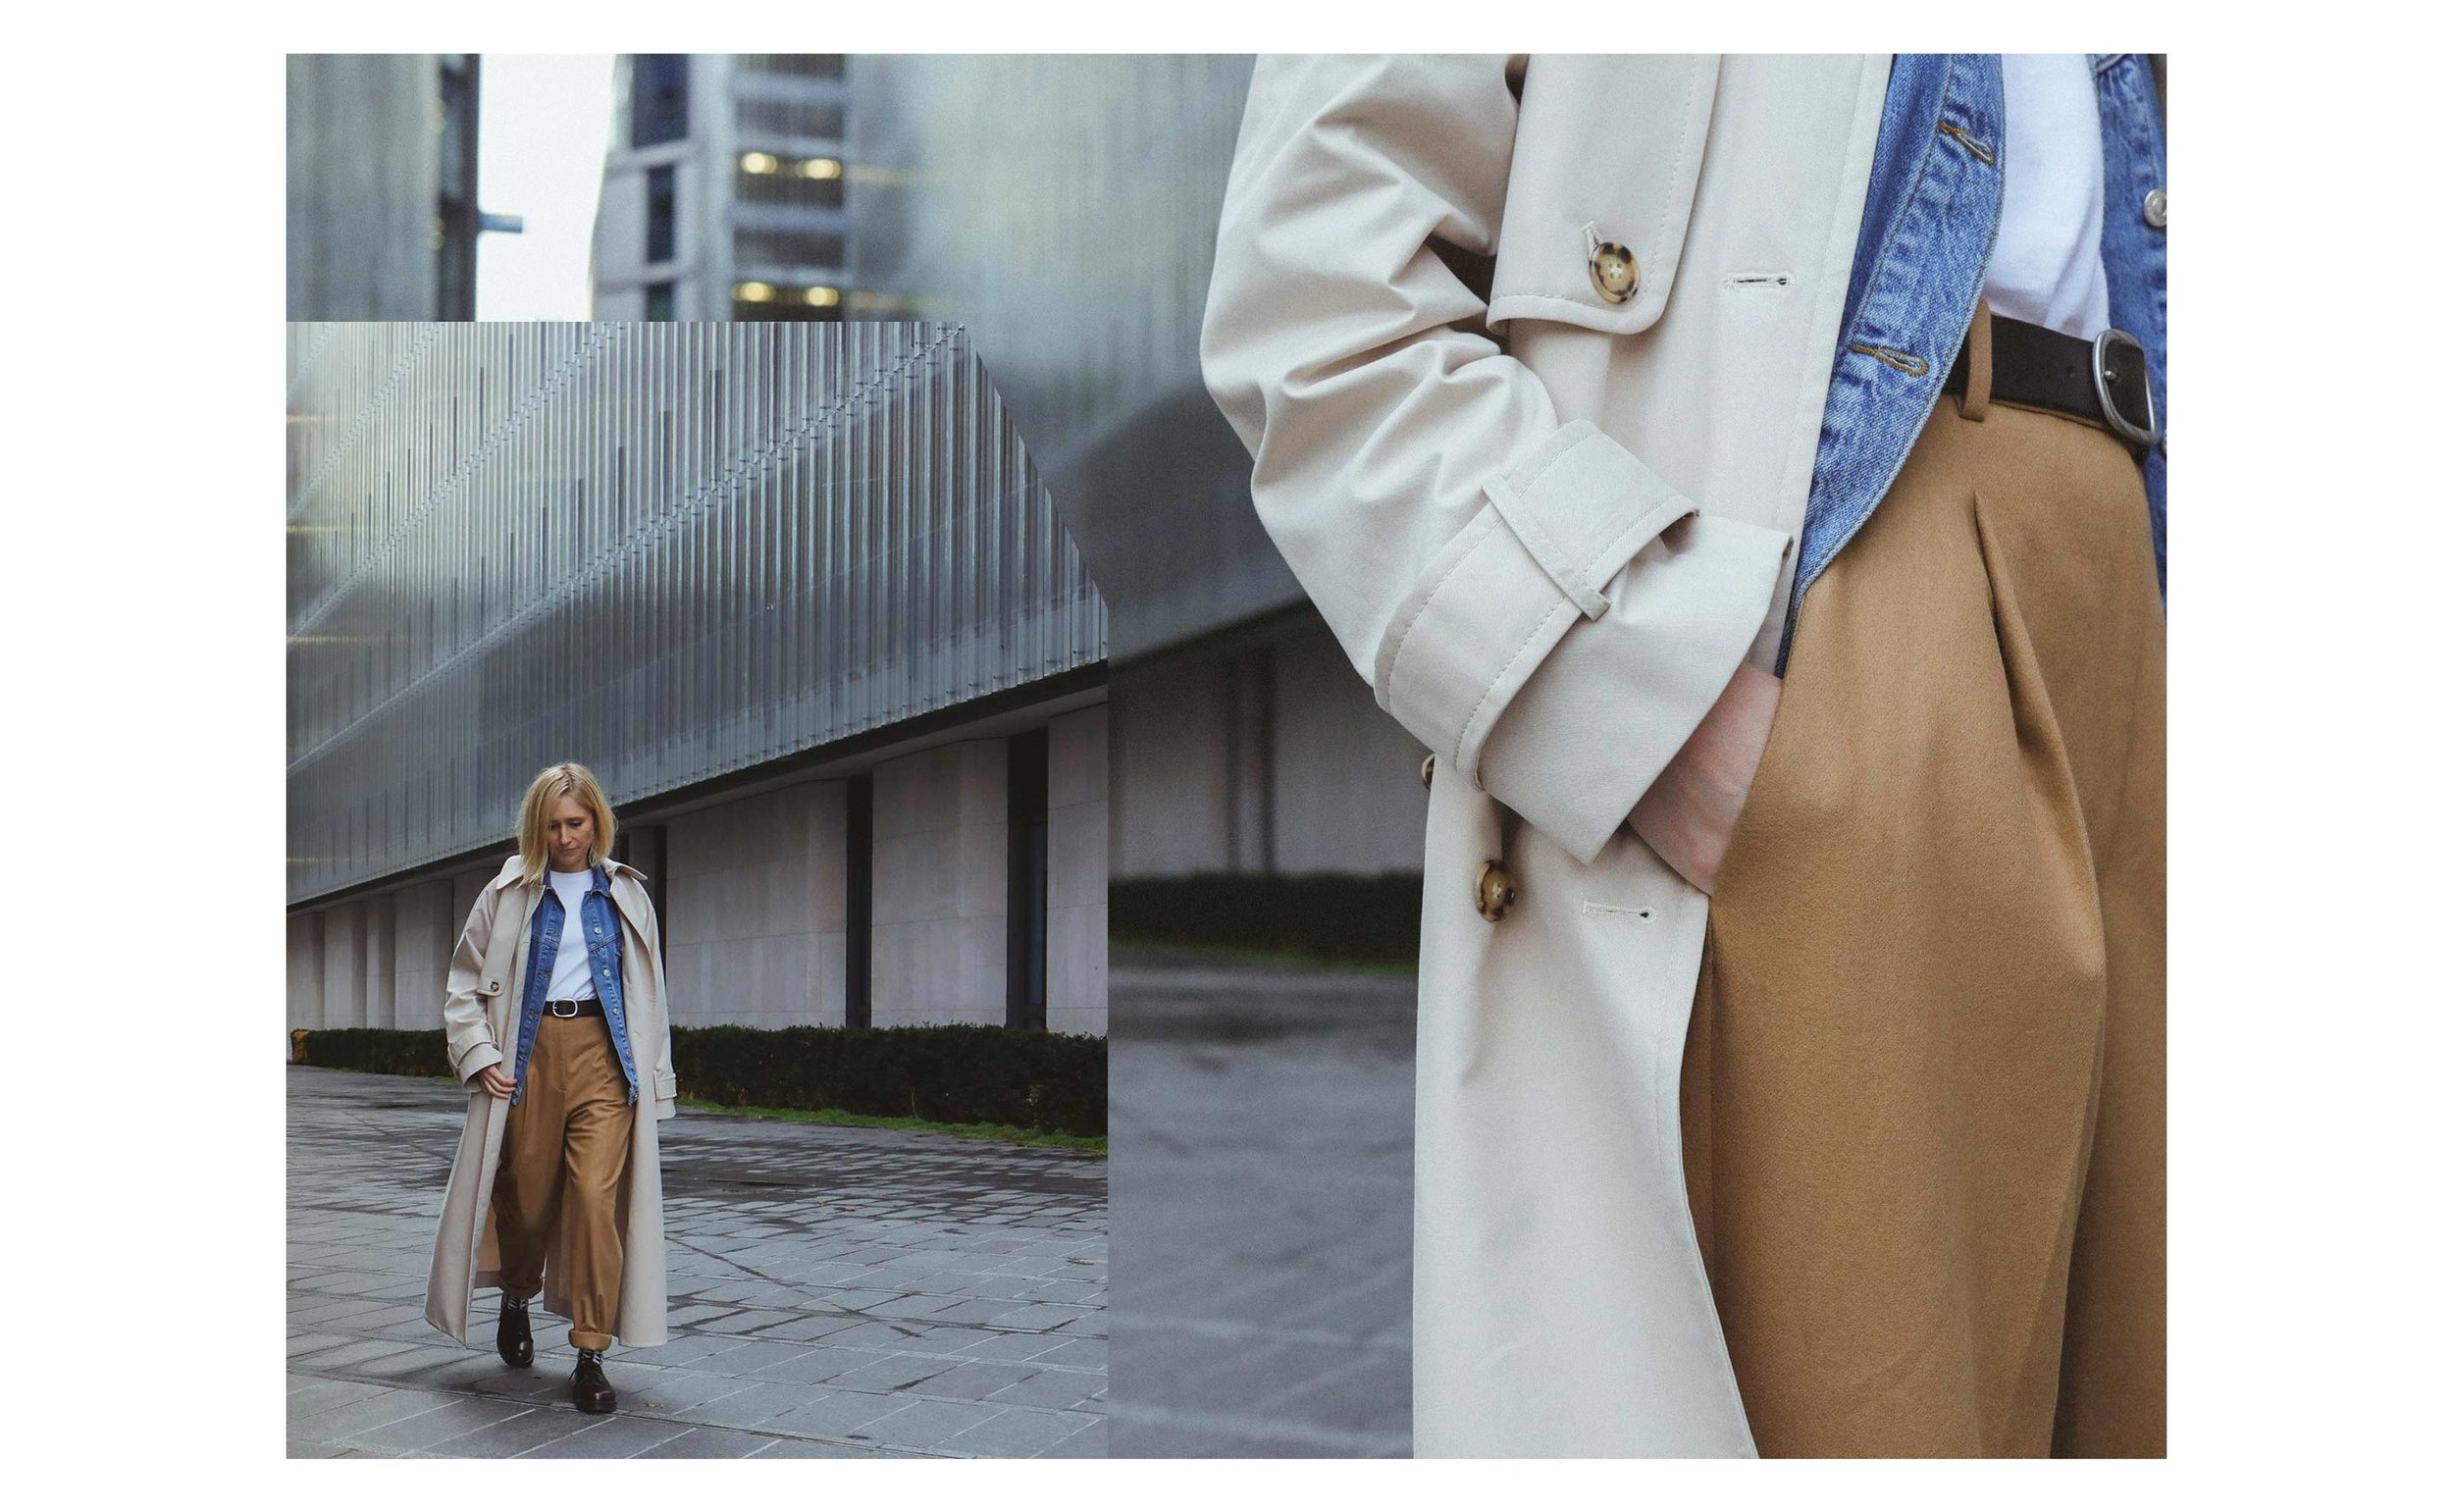 Tan-trousers-11.jpg